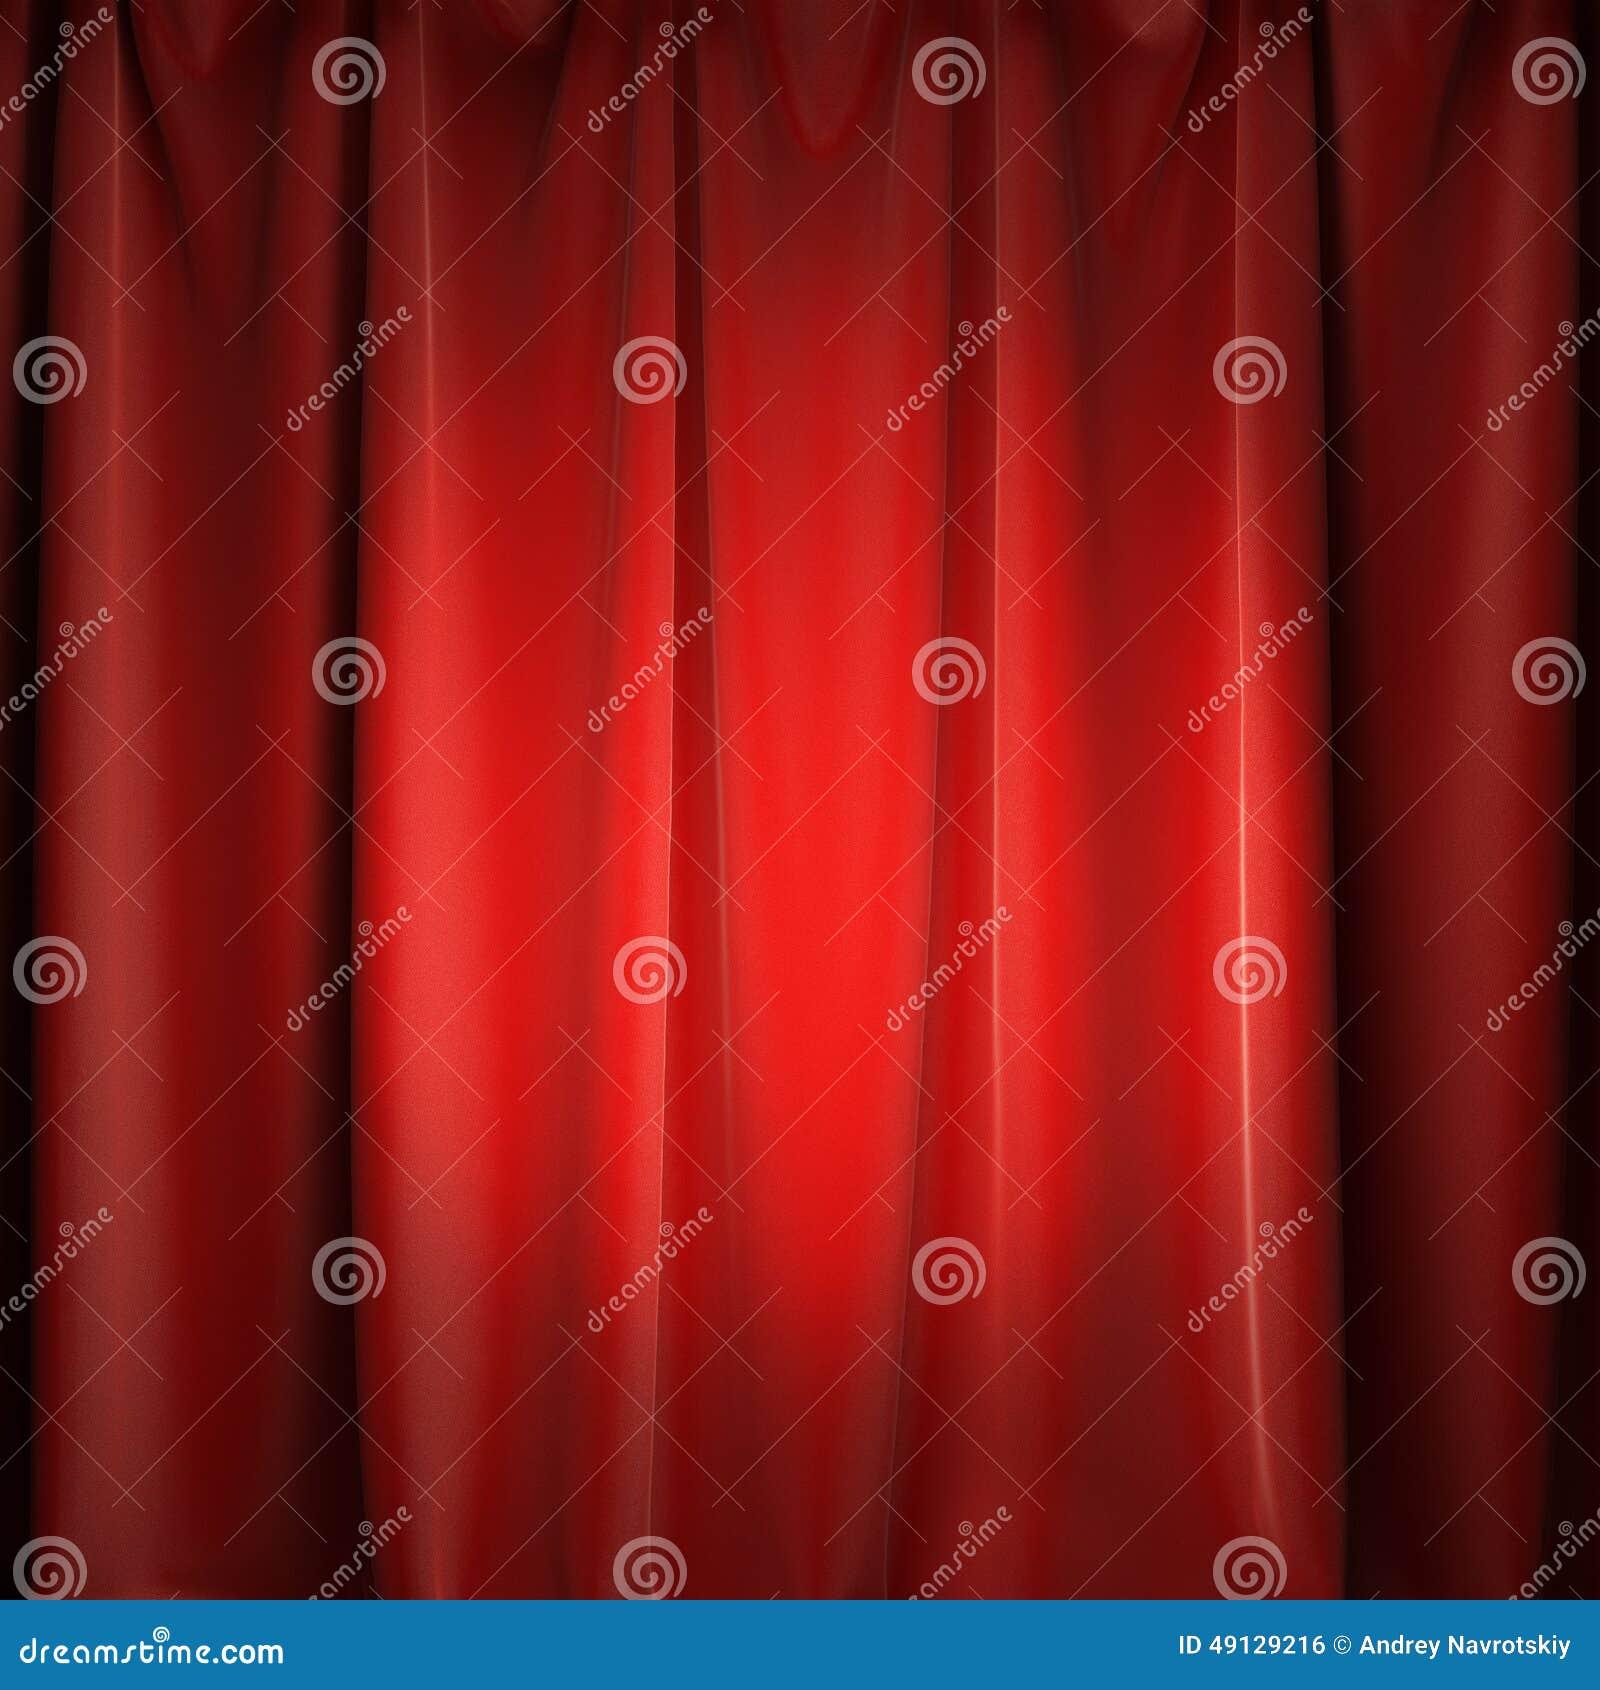 Red curtains with spotlight - Red Spotlight